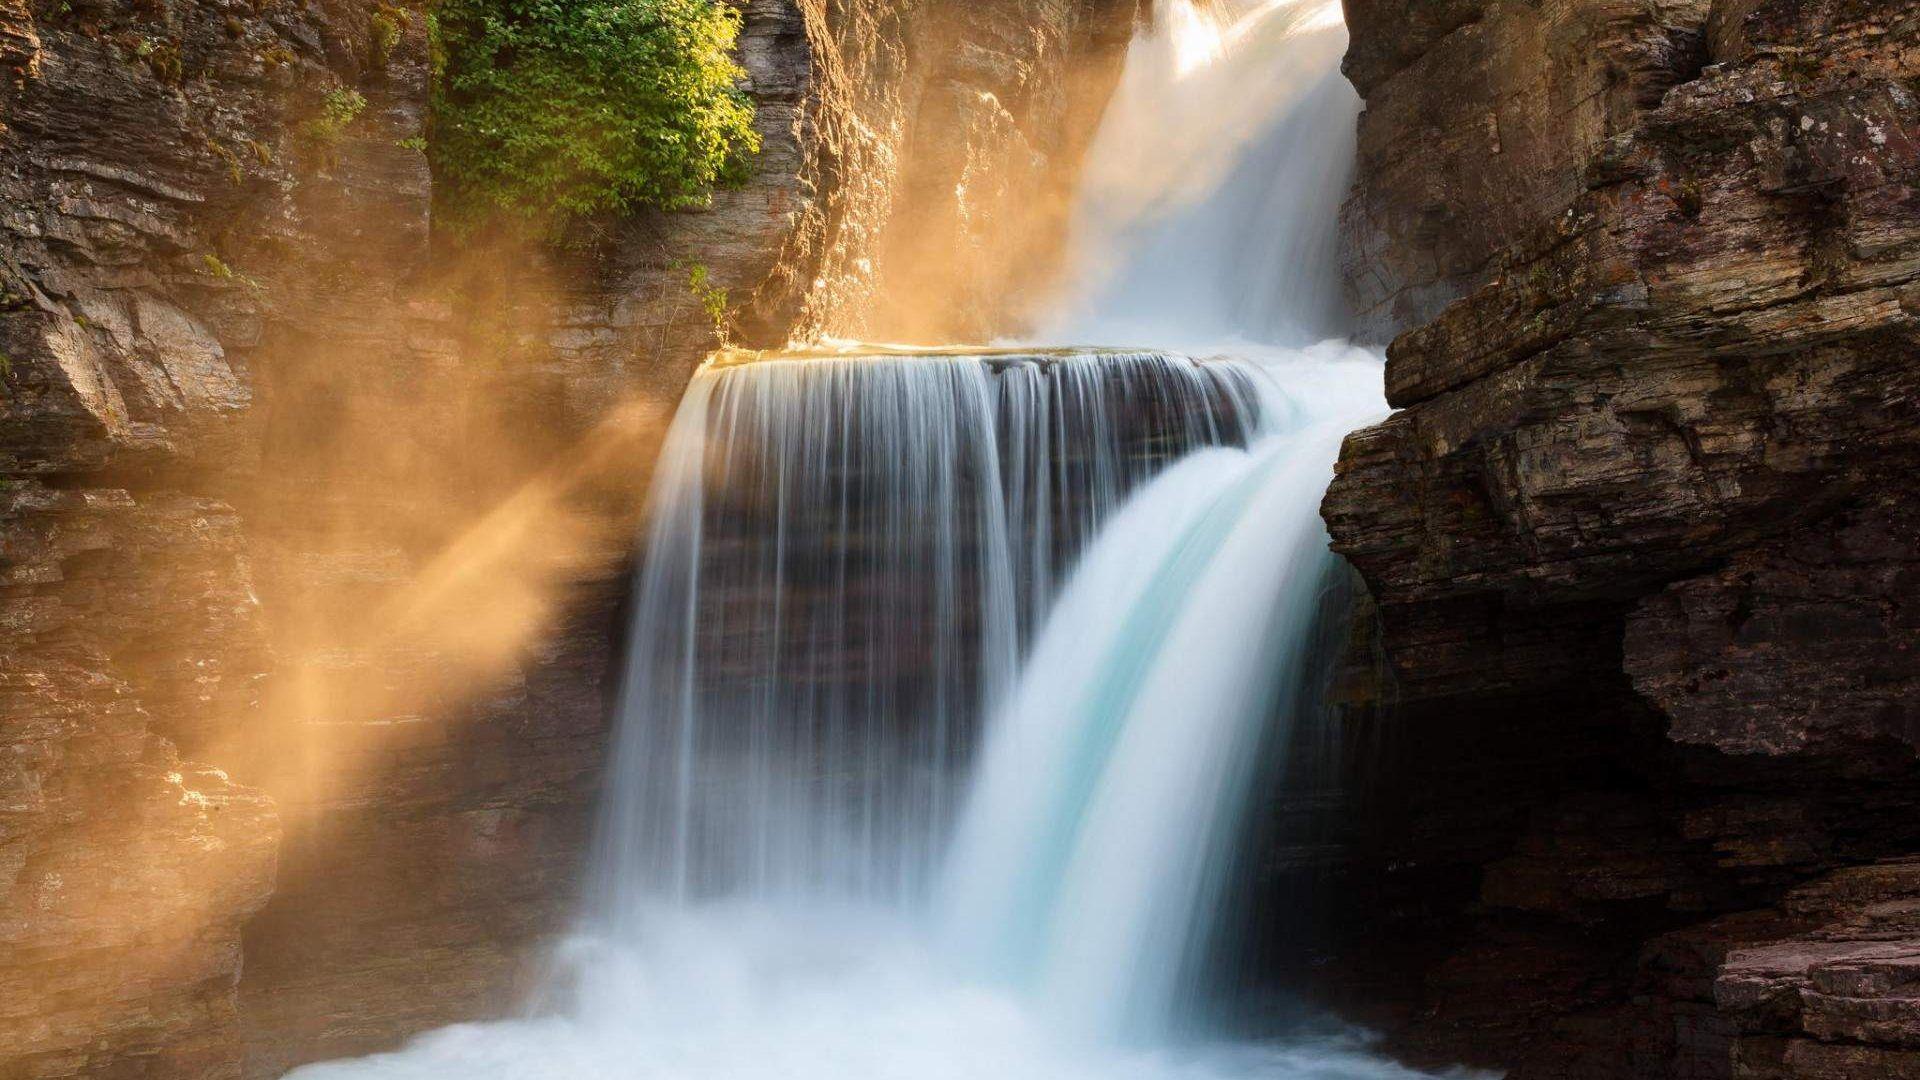 20 Gorgeous Hd Waterfall Wallpapers: Glacier Park Beautiful Waterfall Wallpaper HD [1920 1080